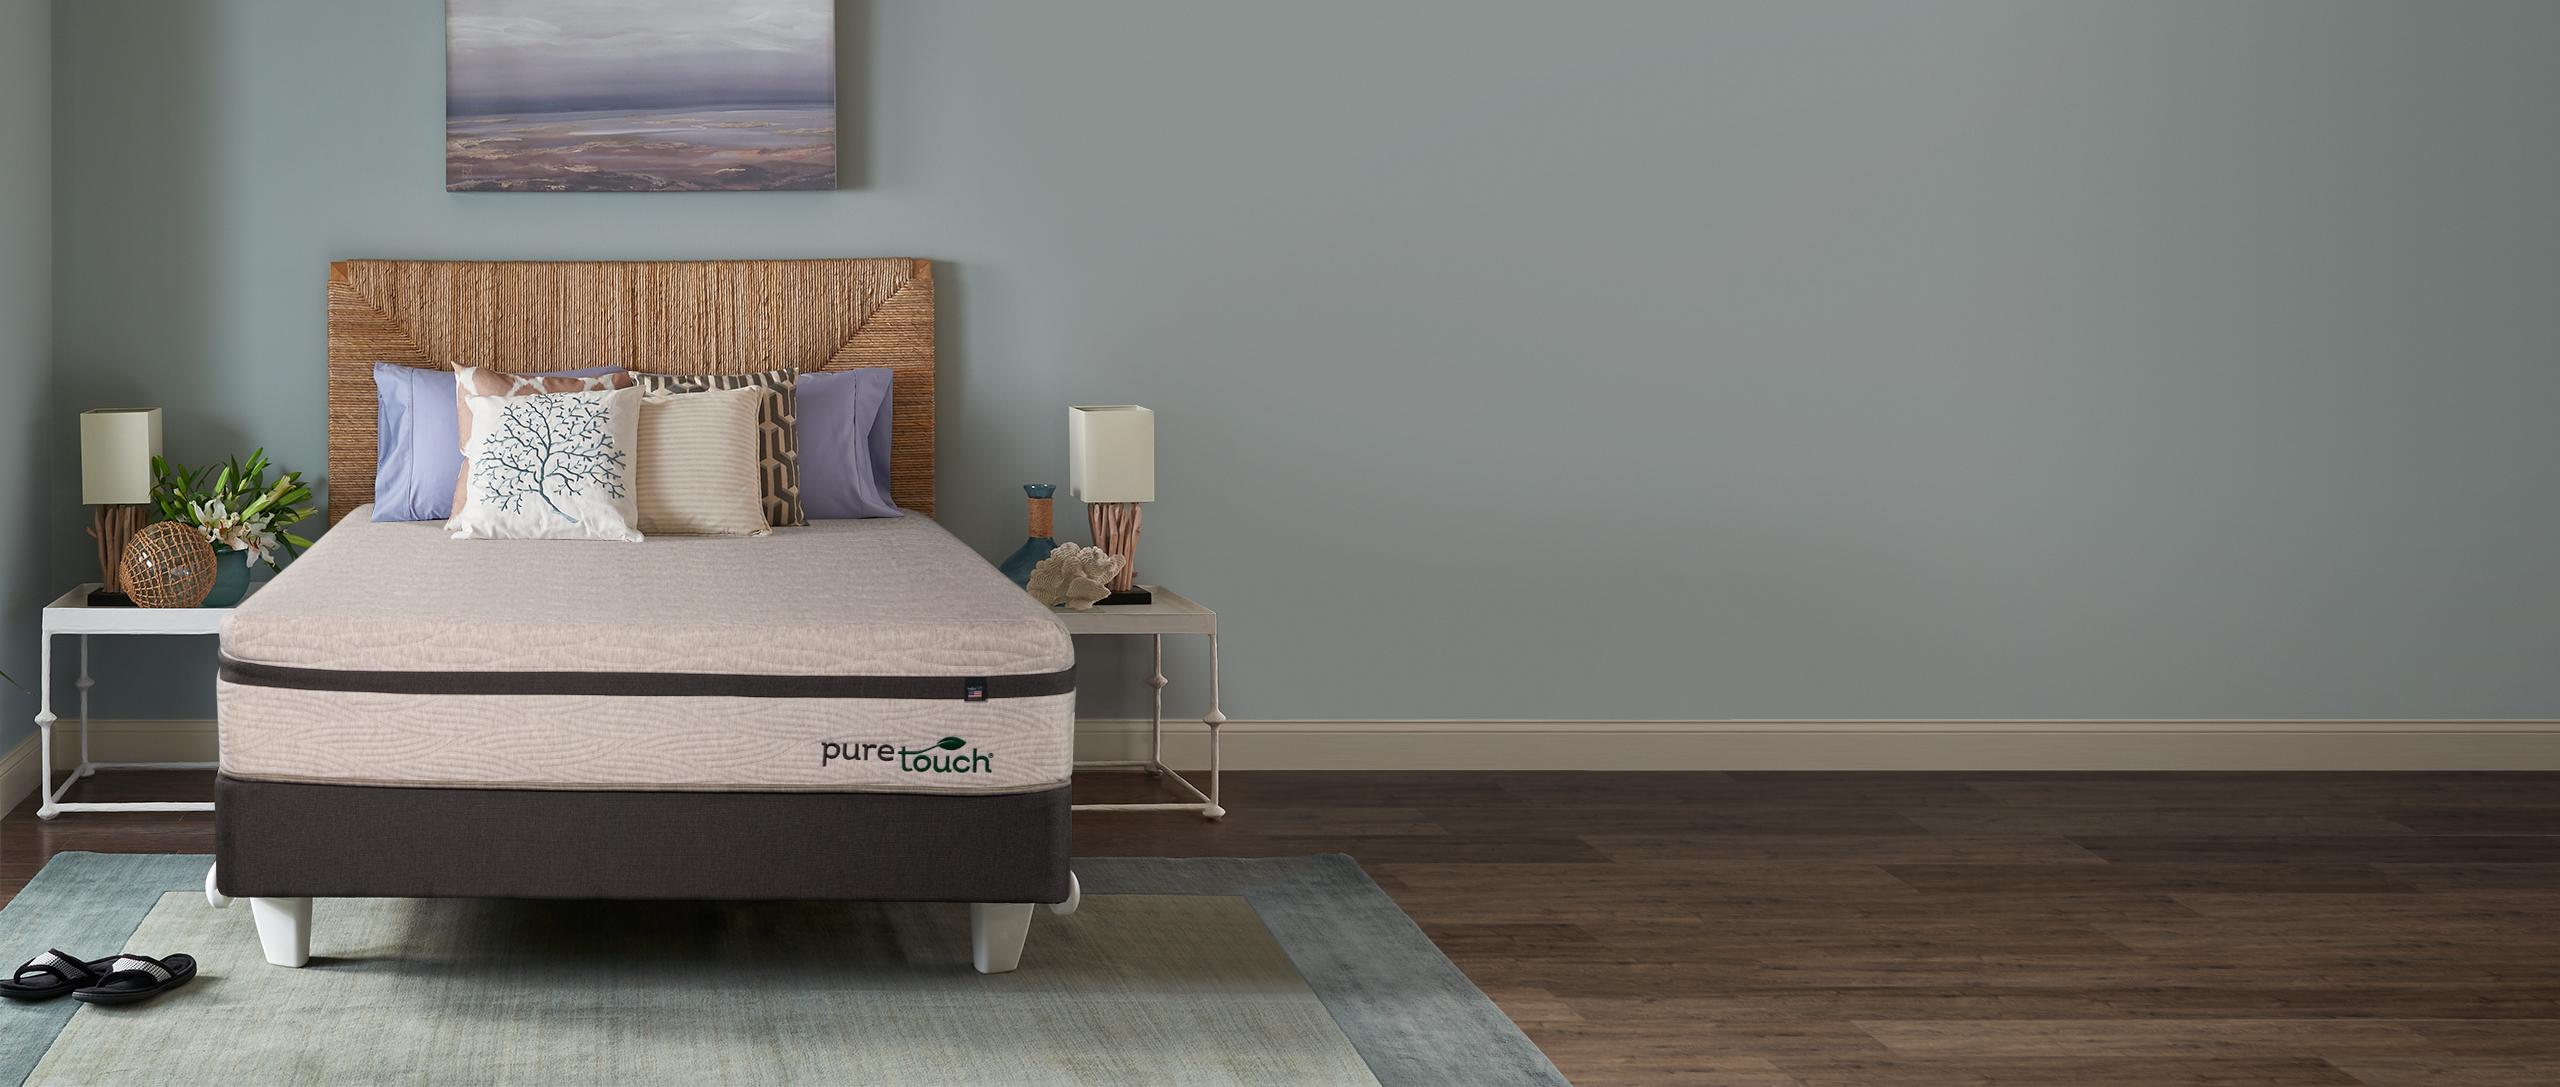 Bravura PureTouch Mattress in a bedroom setting